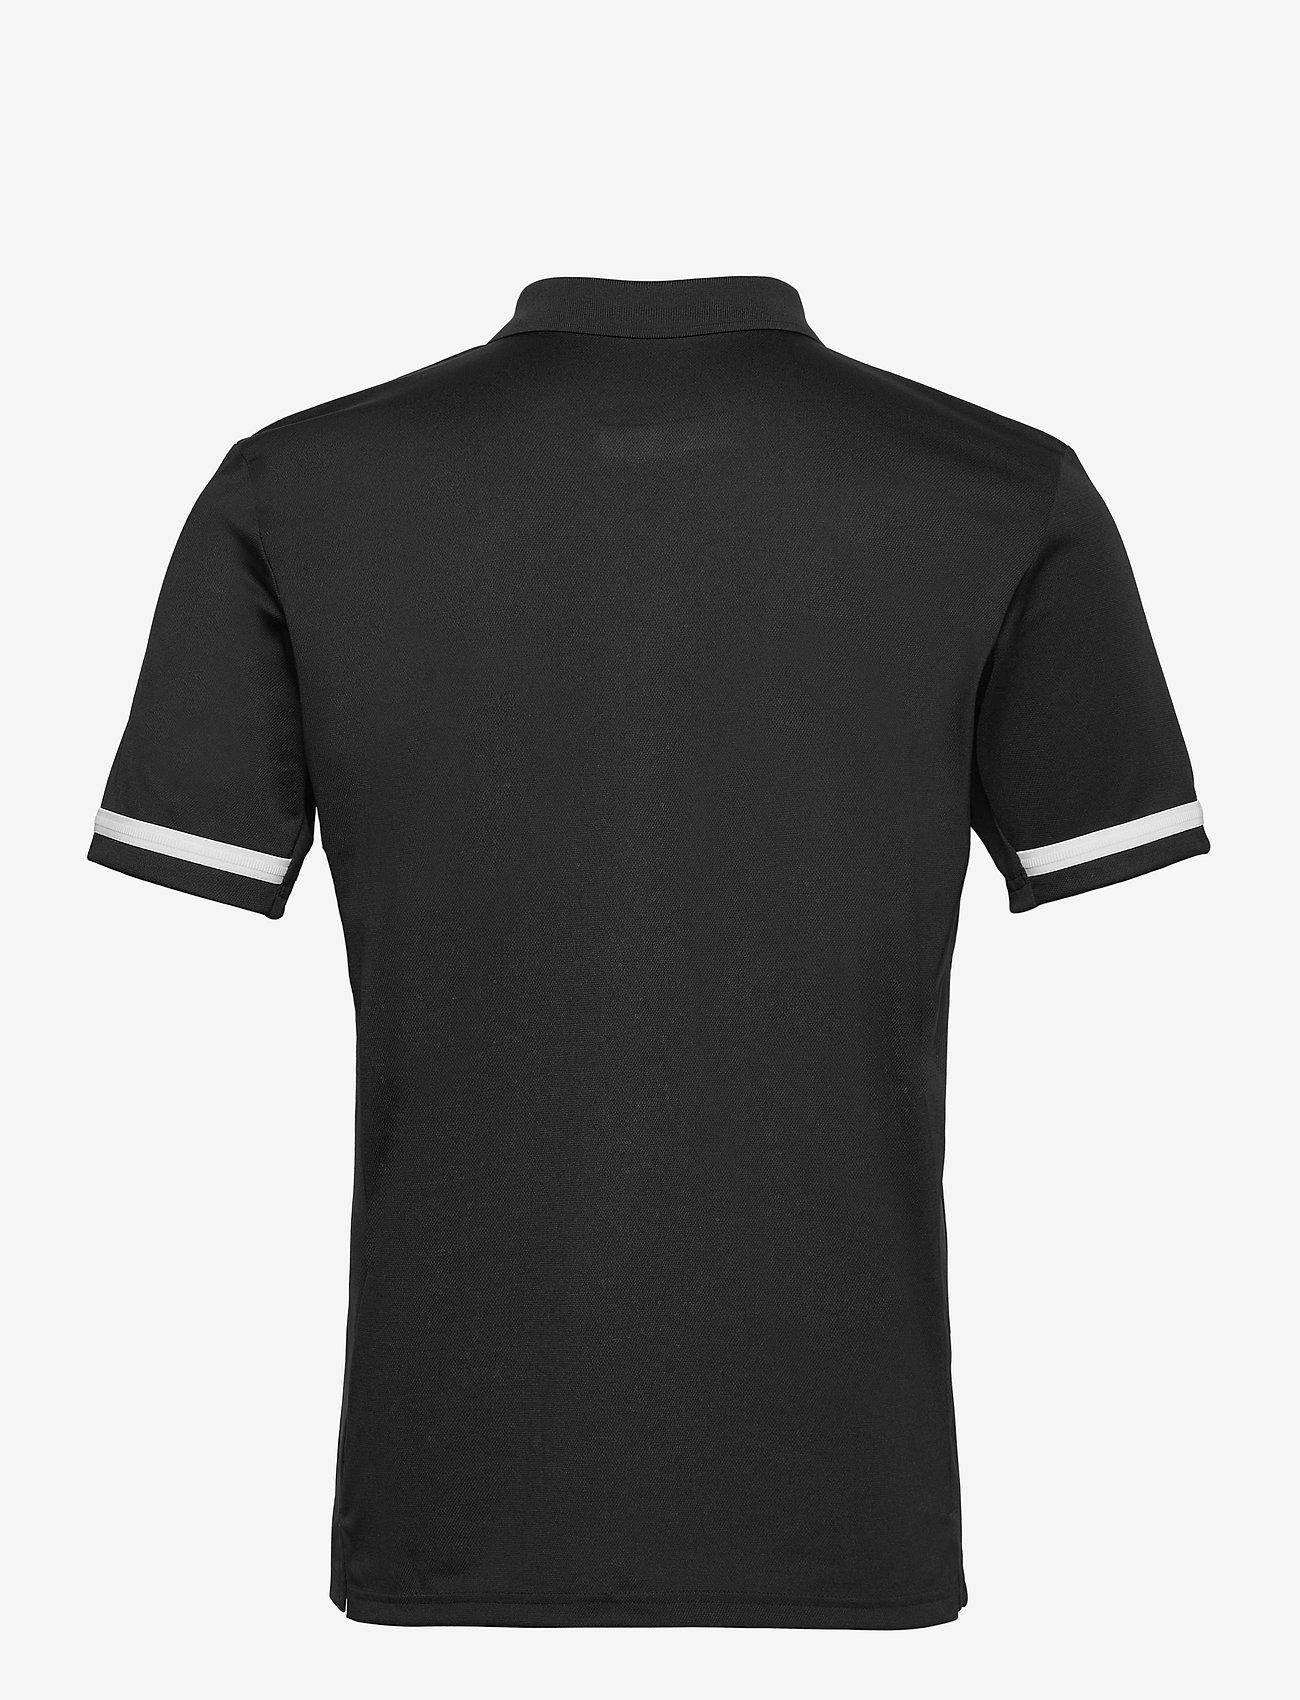 adidas Performance - Team 19 Polo Shirt - kurzärmelig - black/white - 1